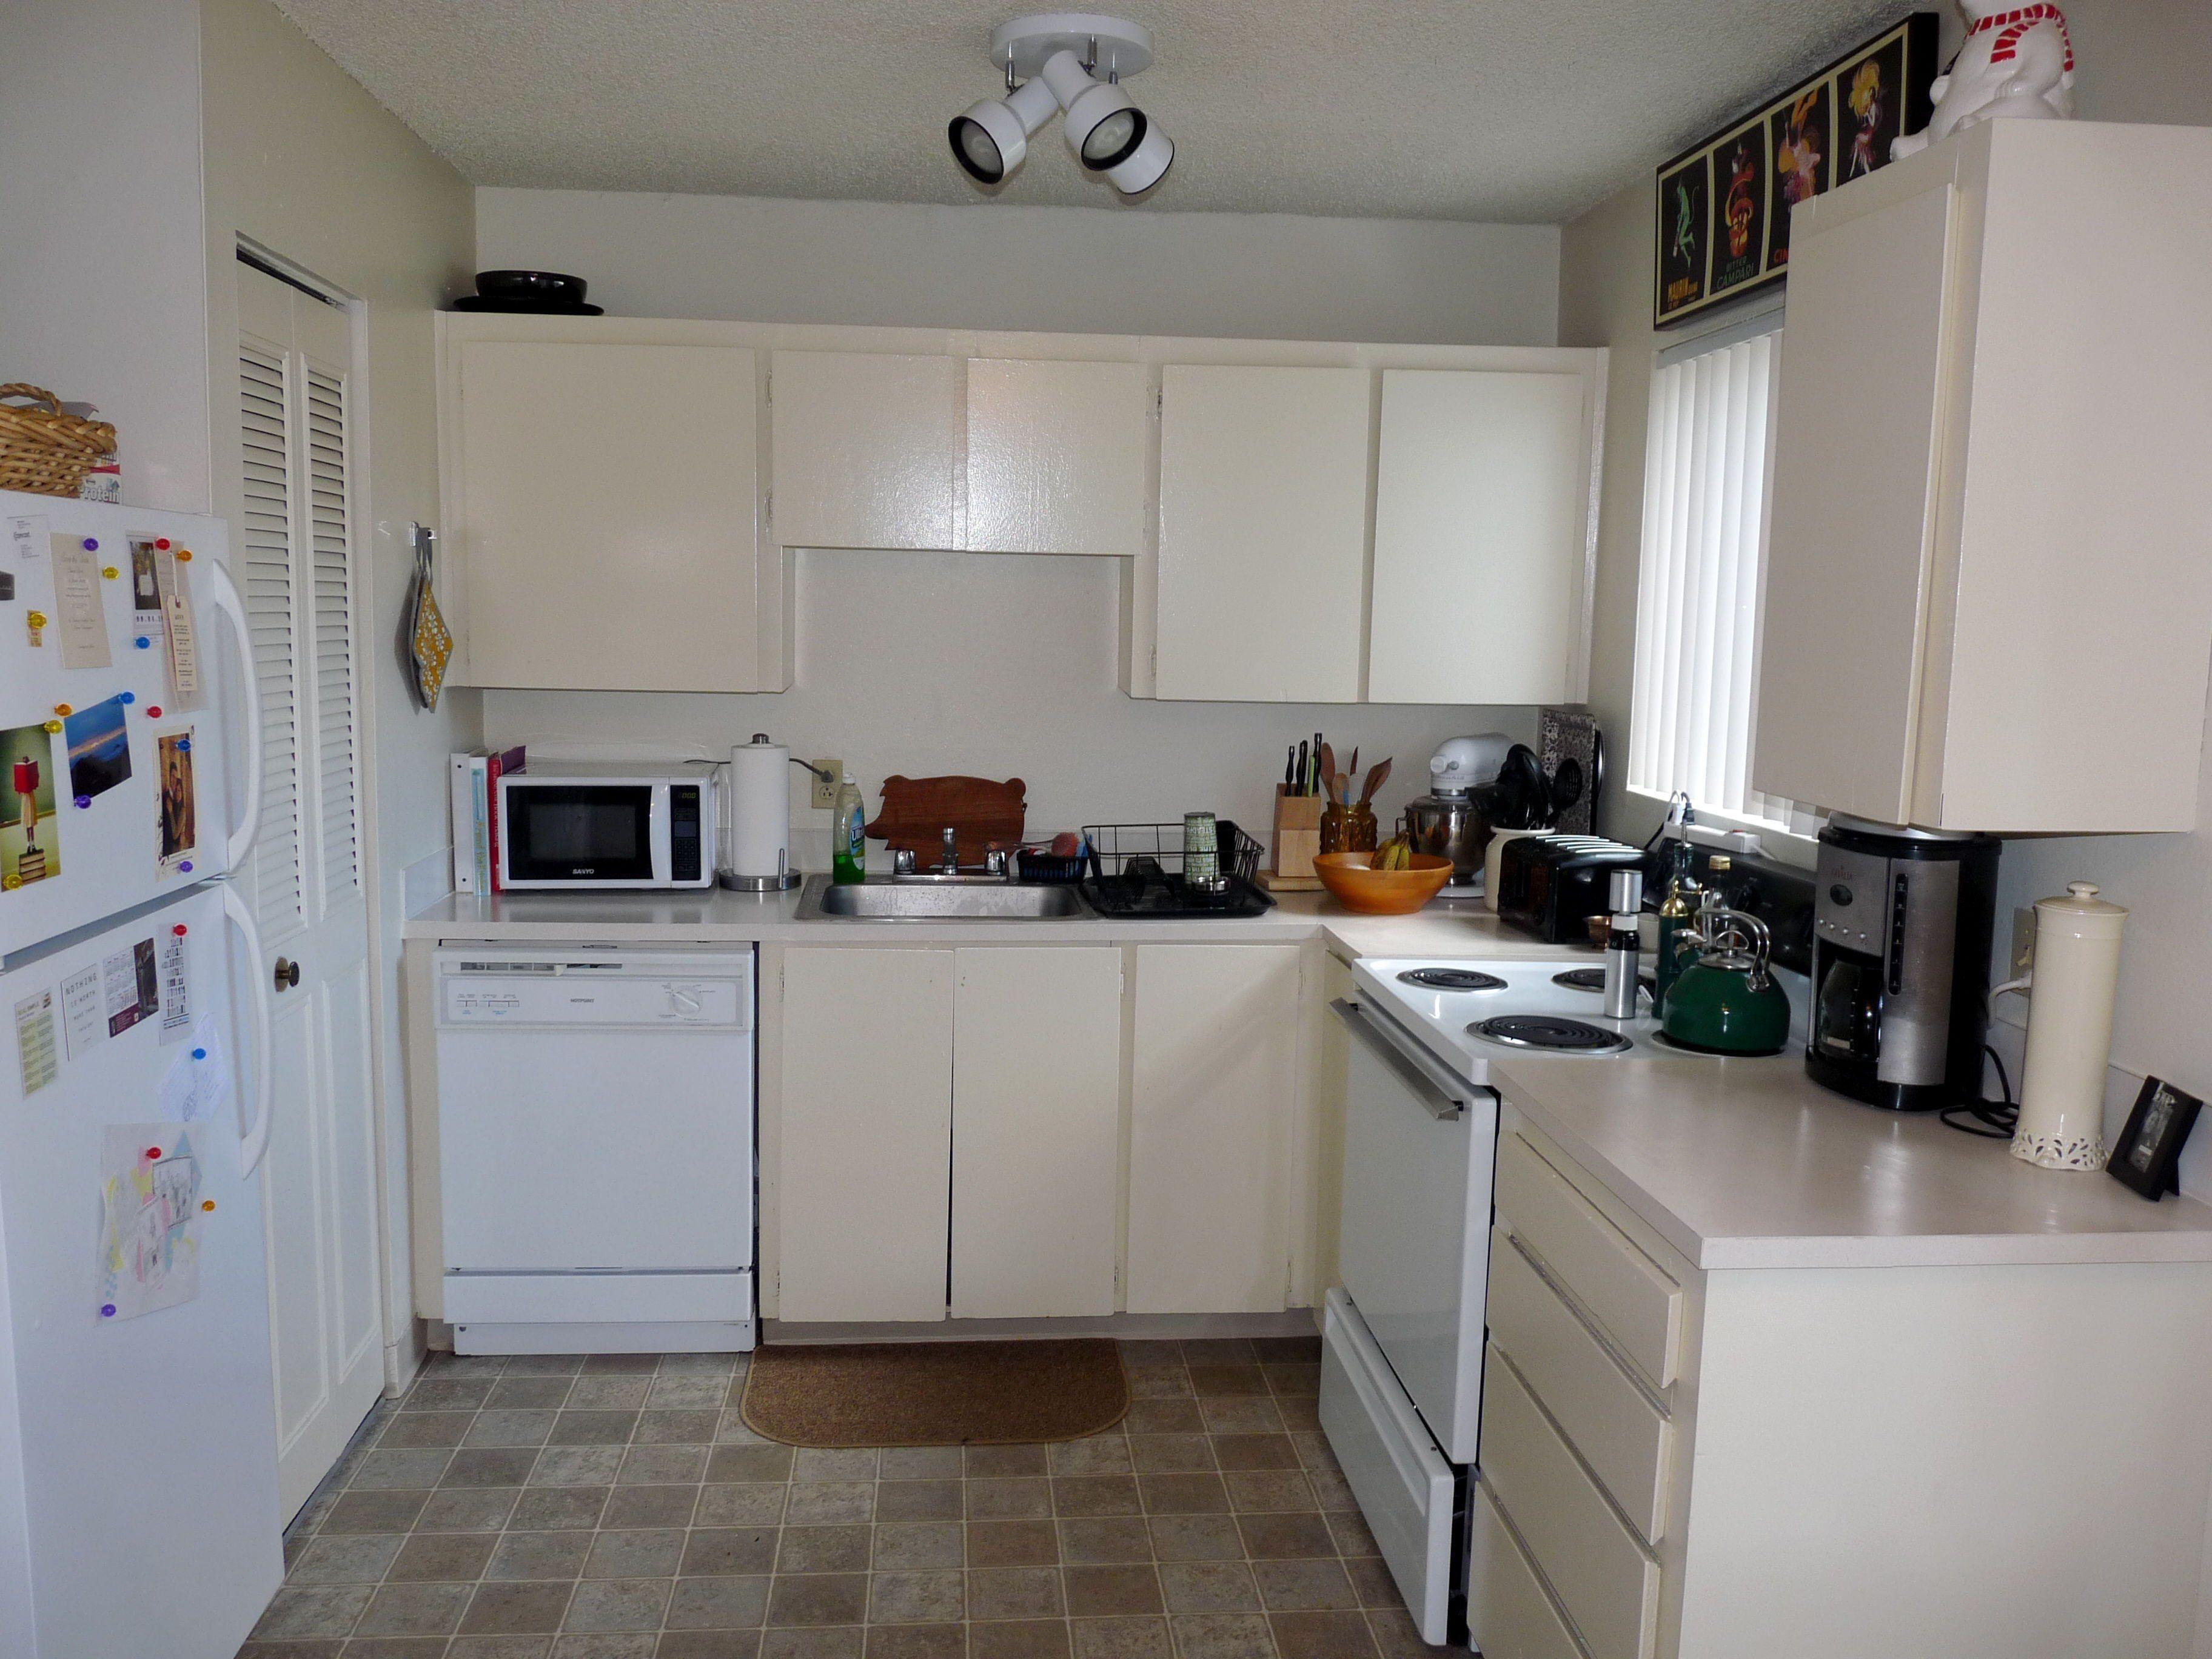 Excellent Picture of Apartment Kitchen Themes Ideas . Apartment ...